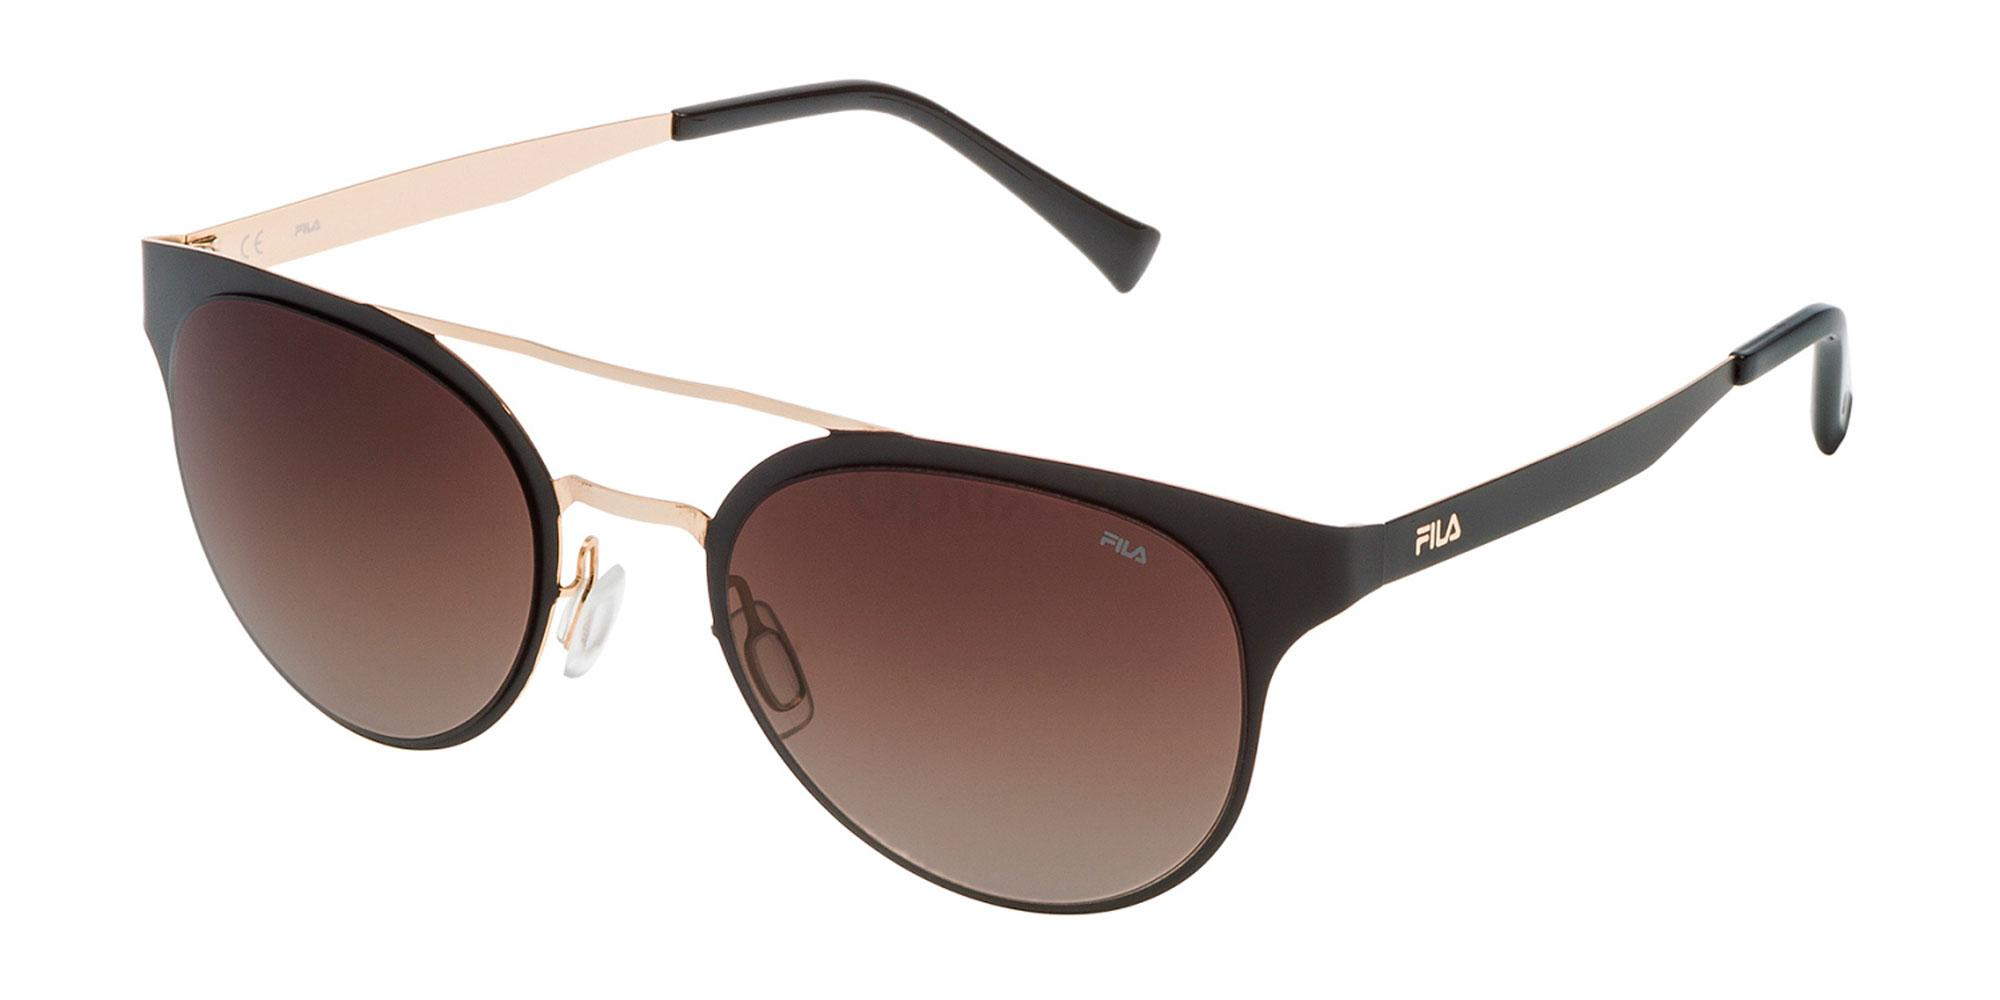 0301 SF9745 Sunglasses, Fila